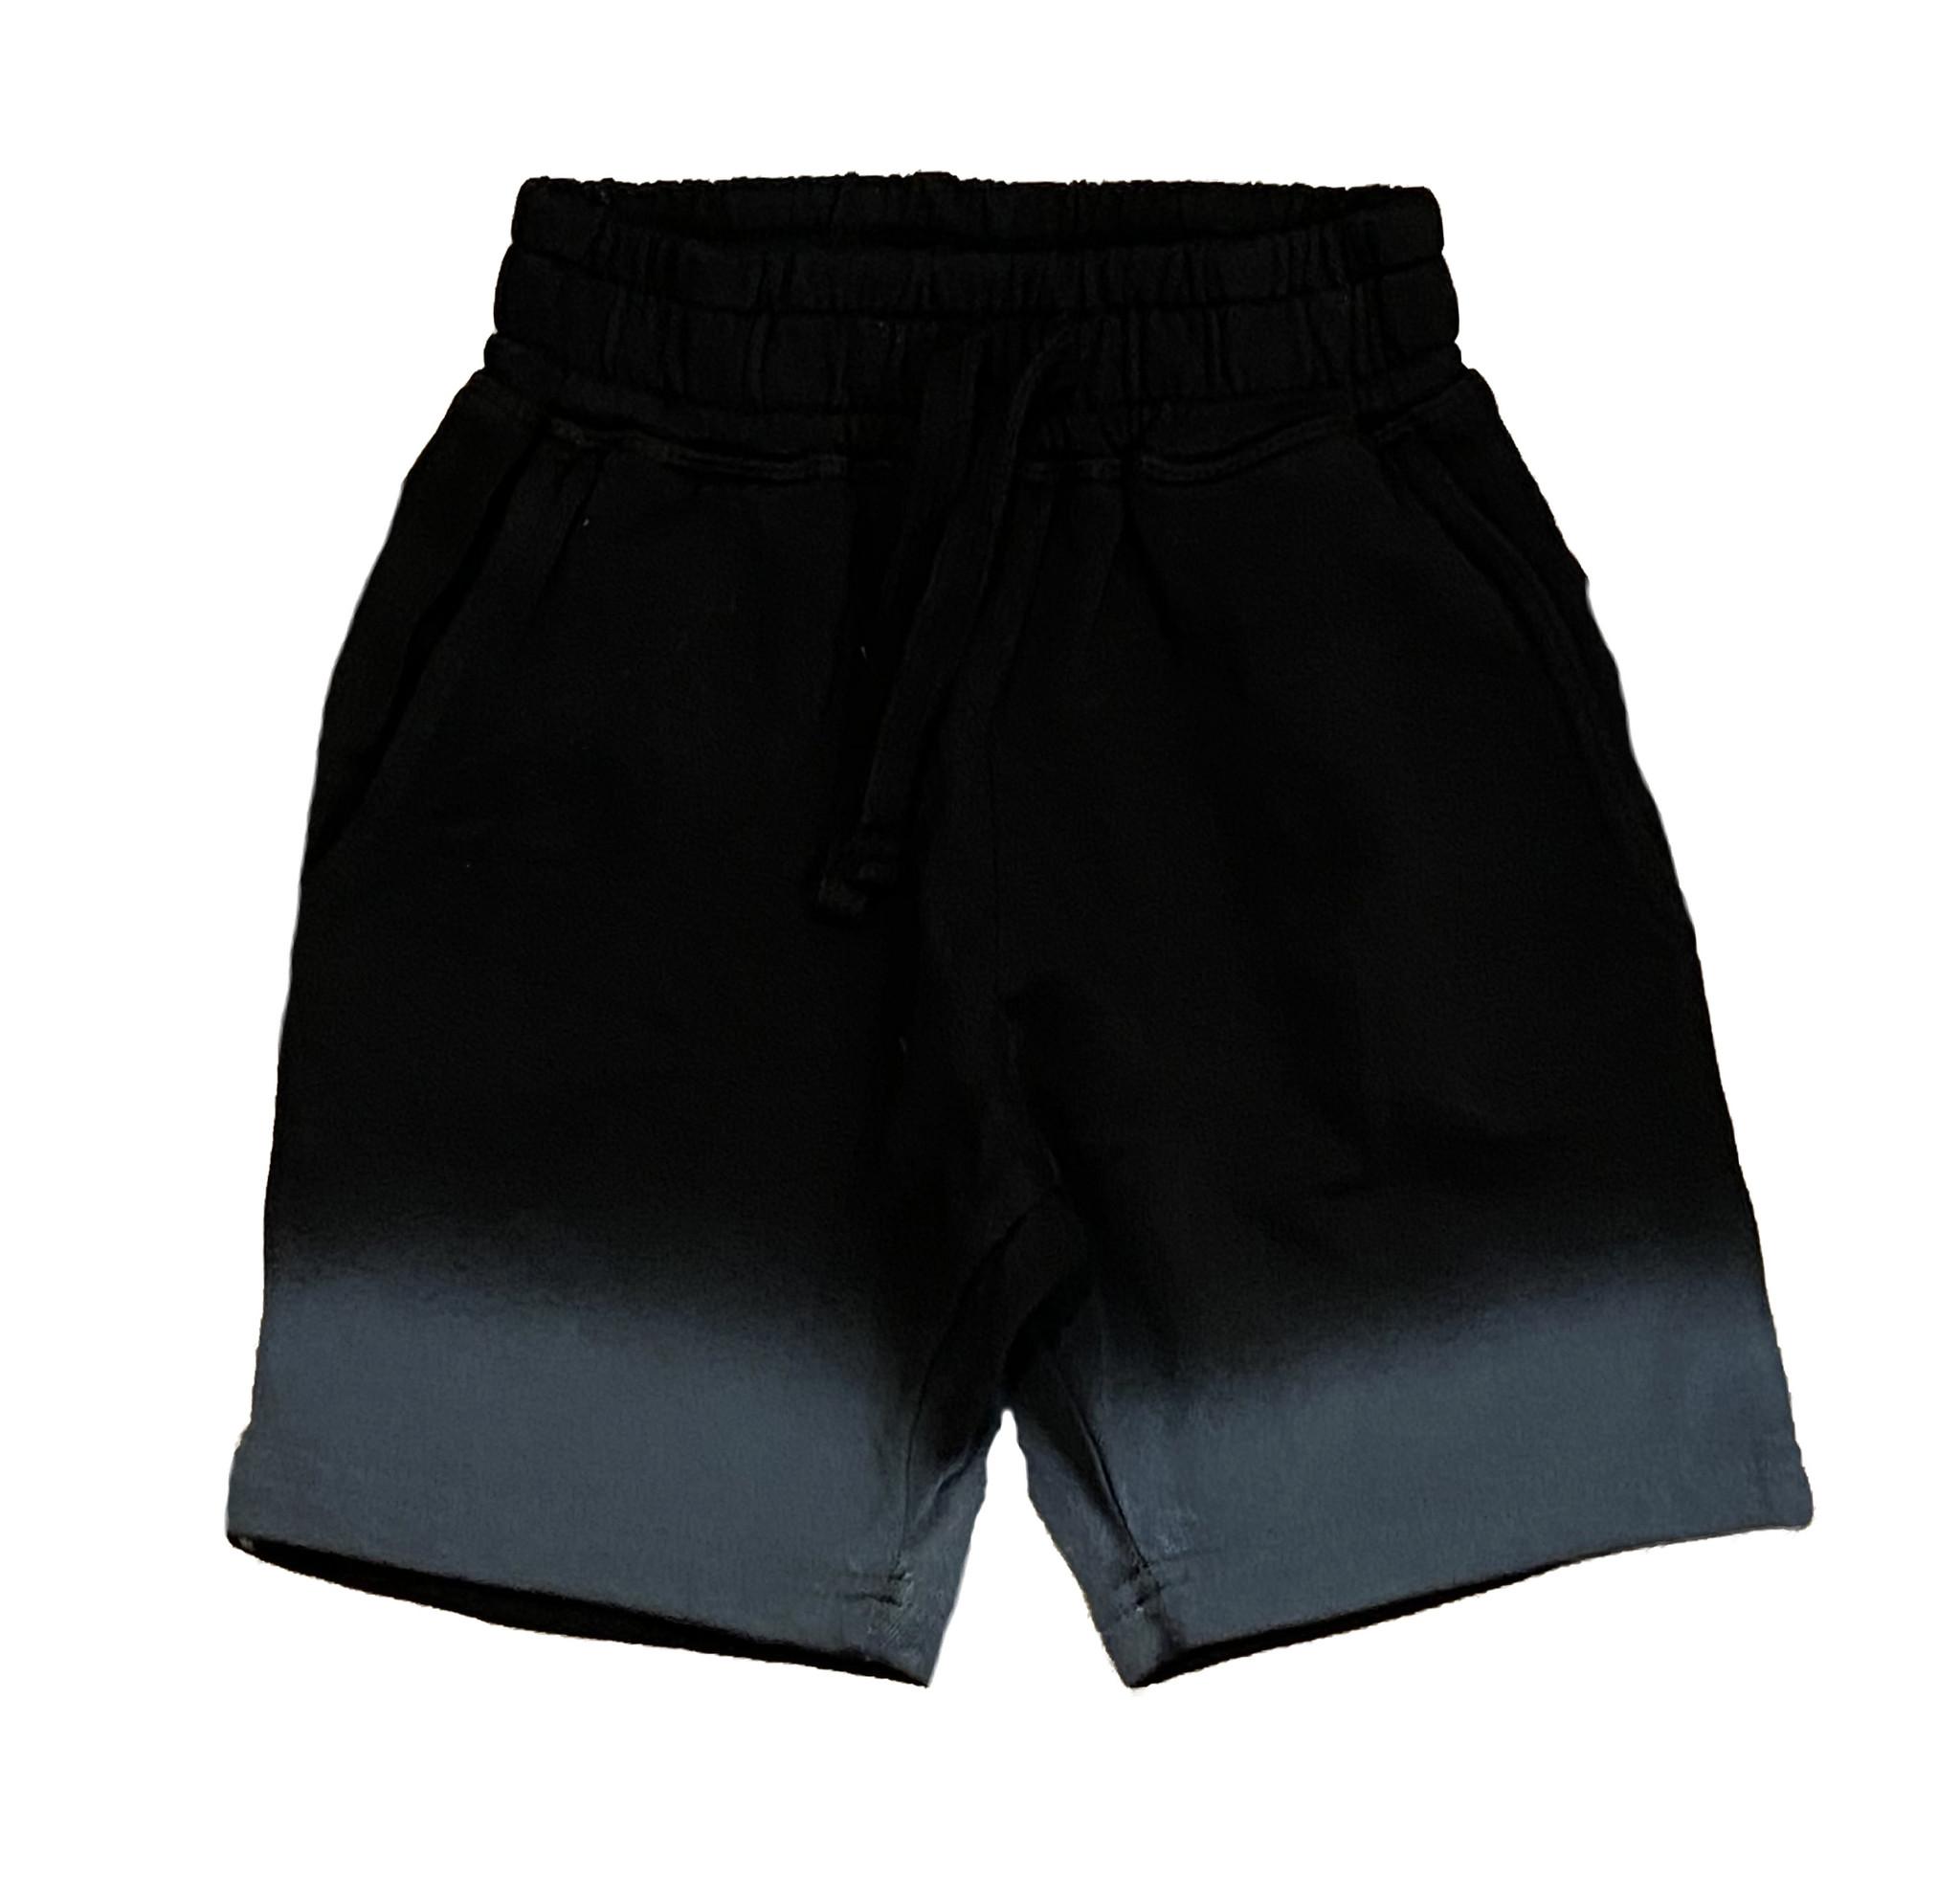 Mish Black Ombre Infant Shorts